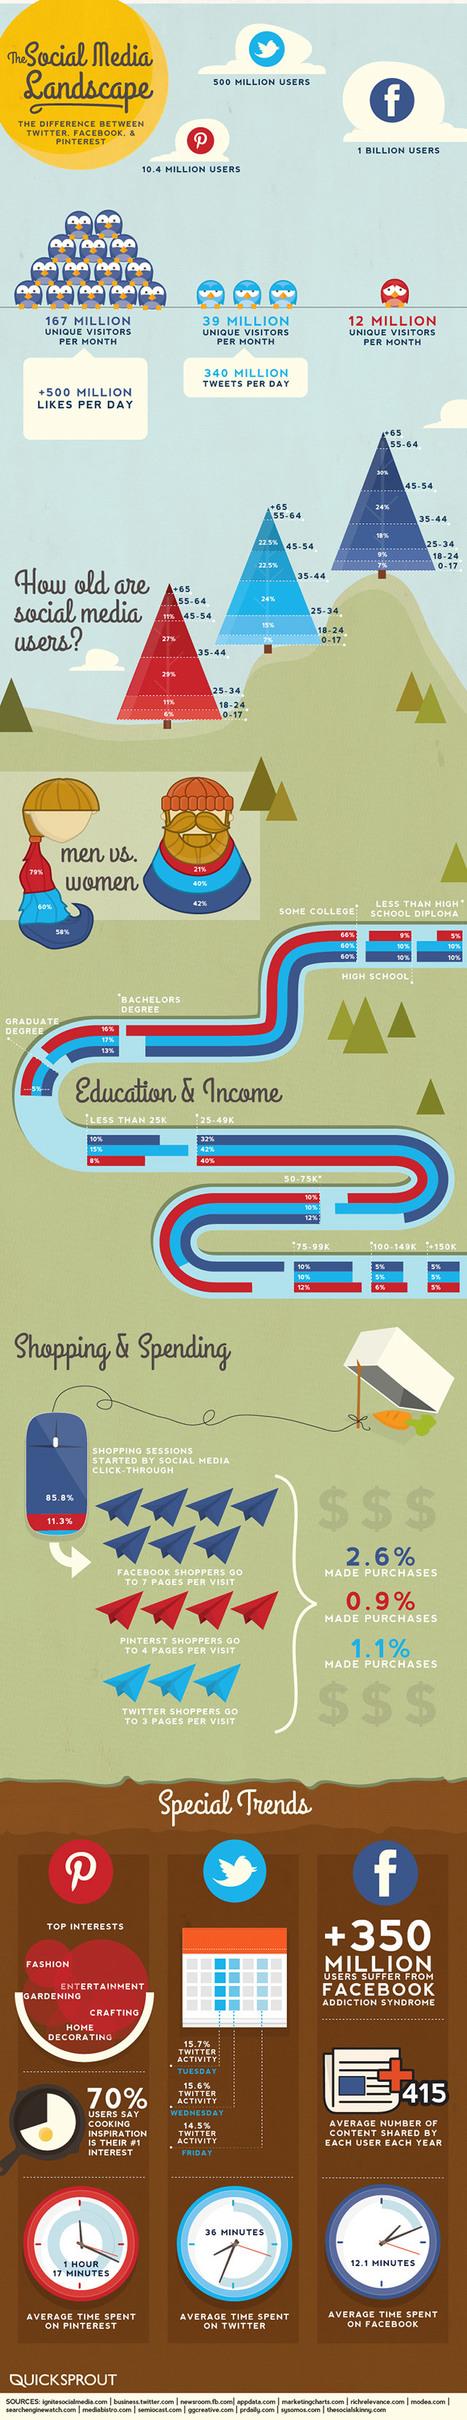 Facebook vs Twitter vs Pinterest – 2013 Statistics [Infographic]   visualizing social media   Scoop.it